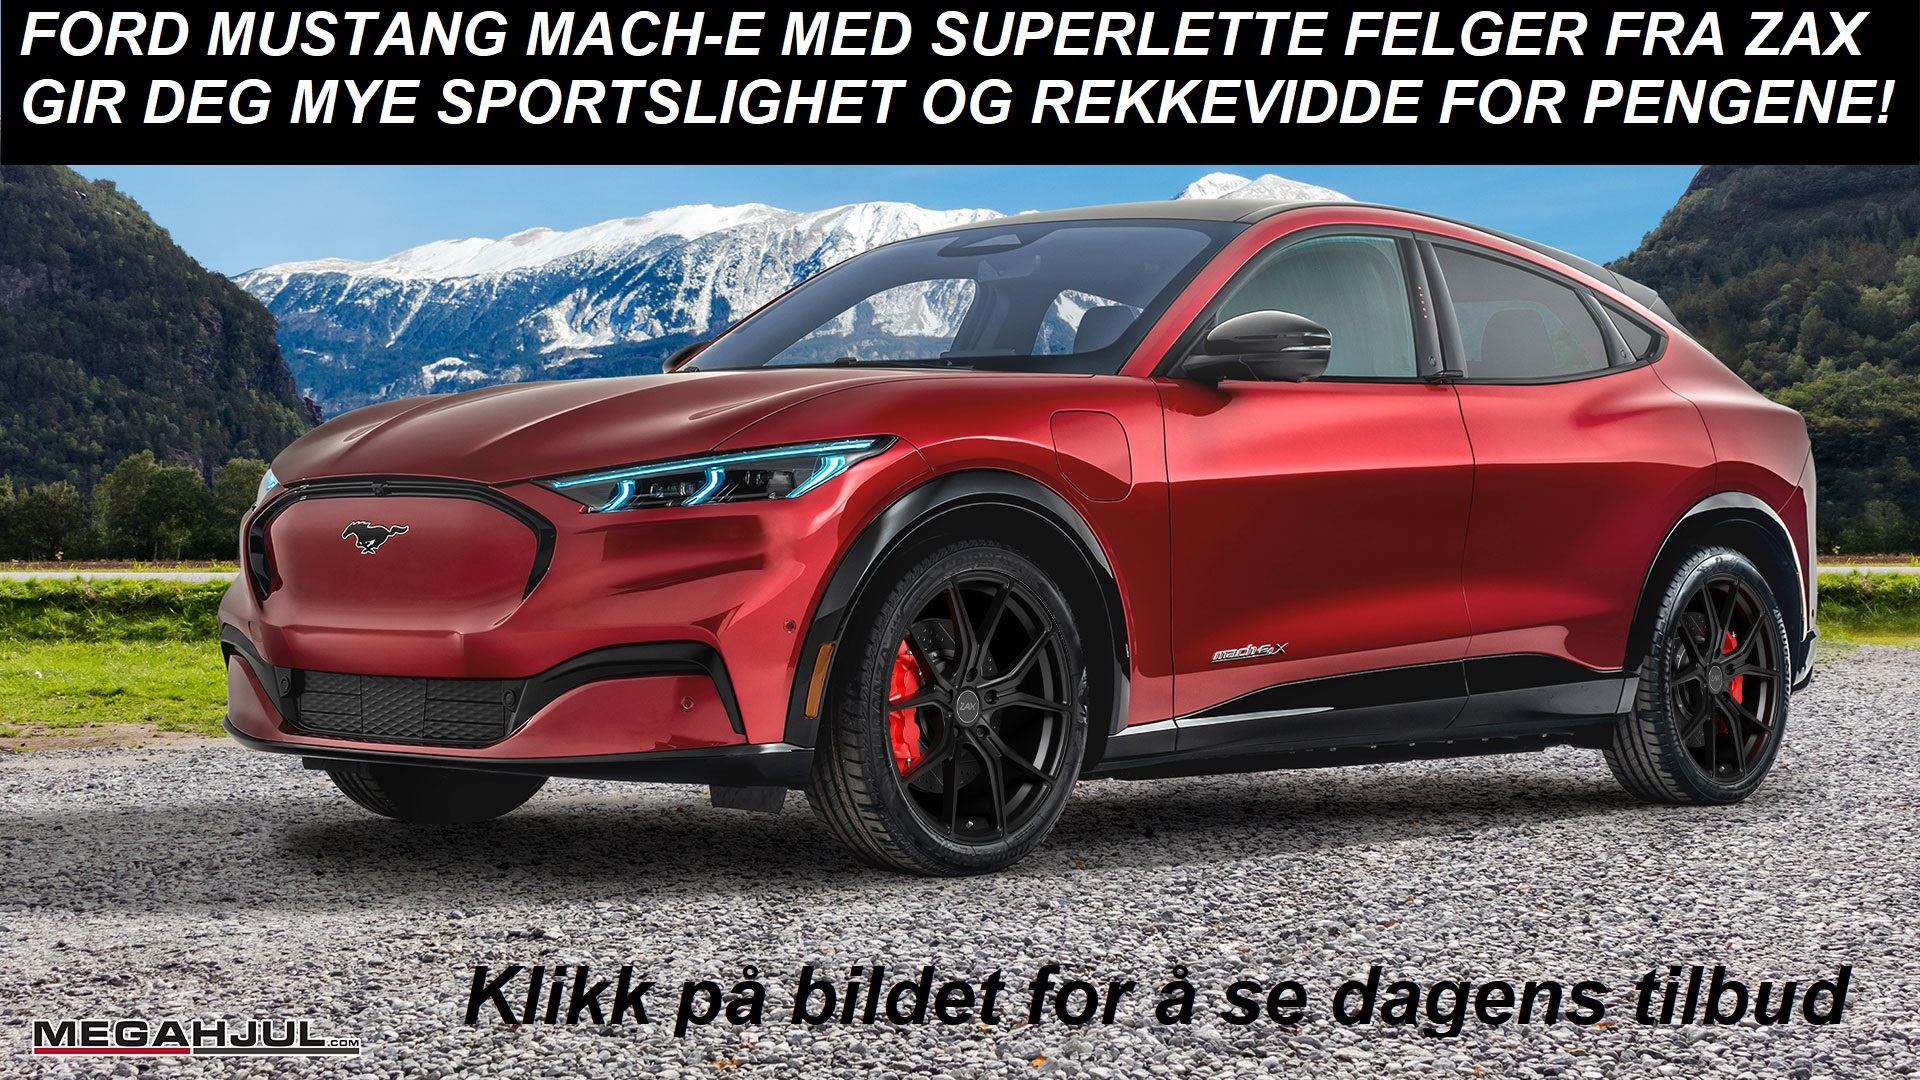 ford-mustang-mach-e-vinterhjul-felger-økt-rekkevidde